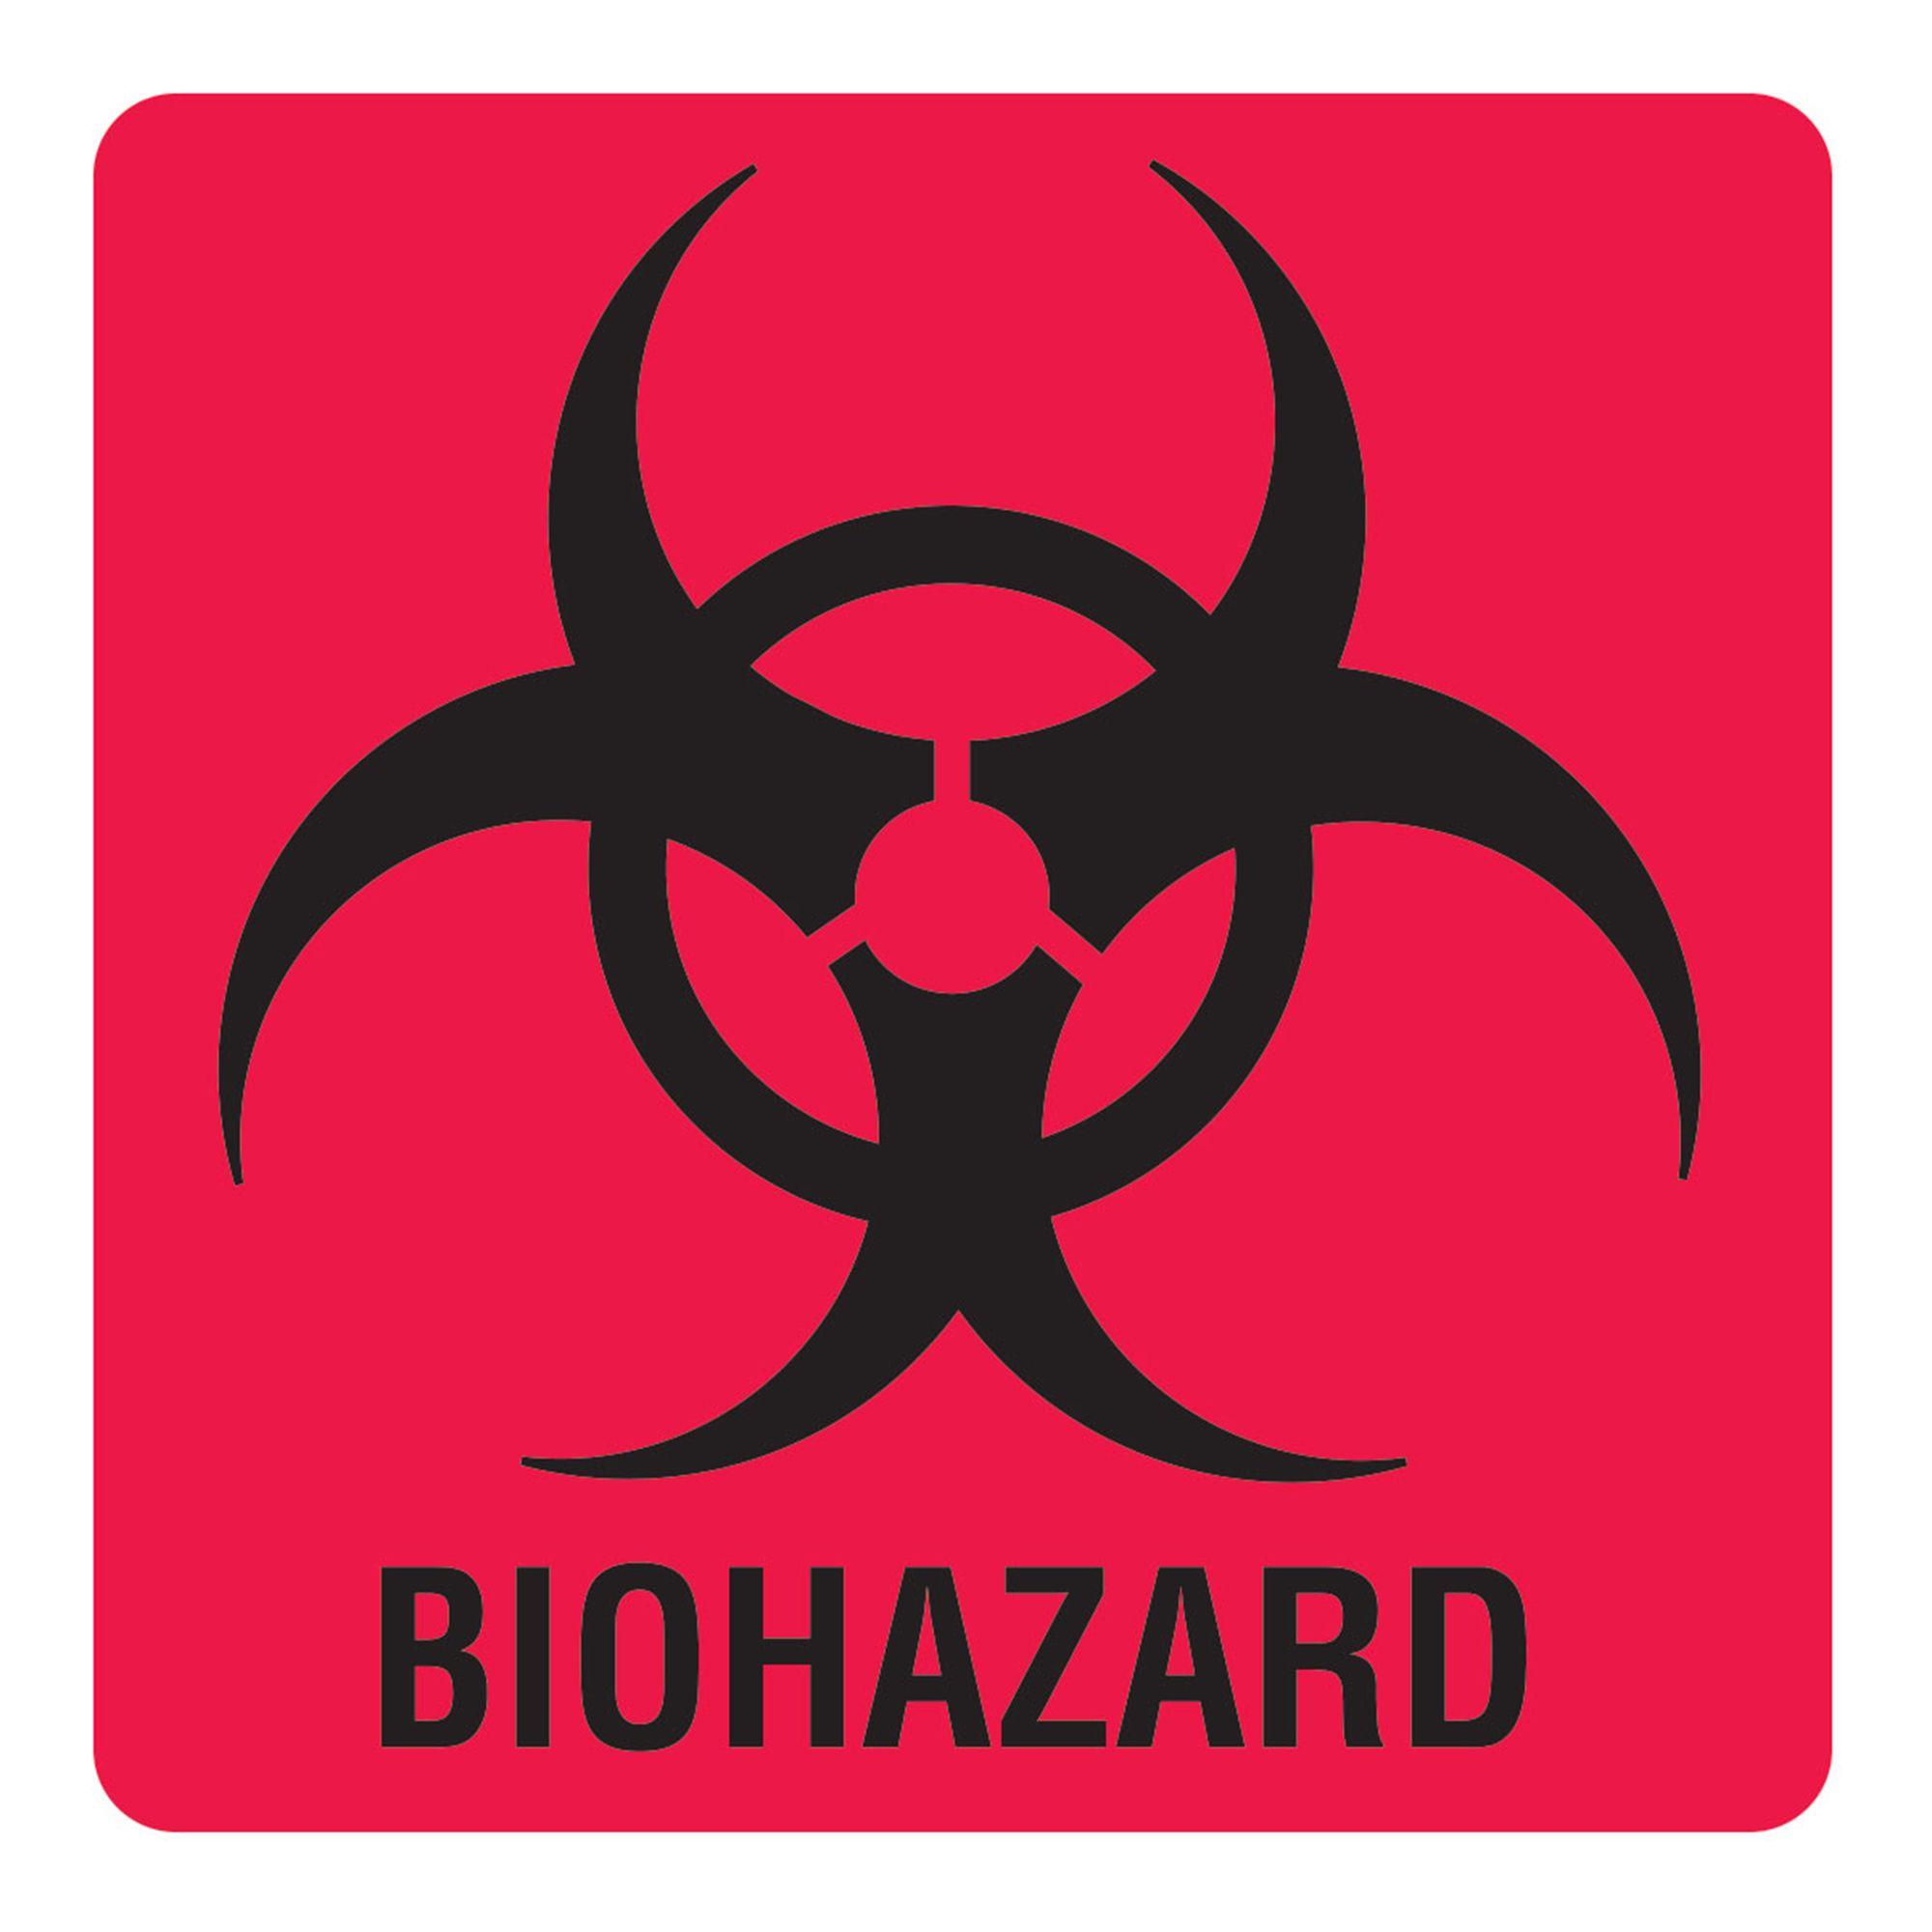 Biohazardousmedical And Microbiological Waste Environmental